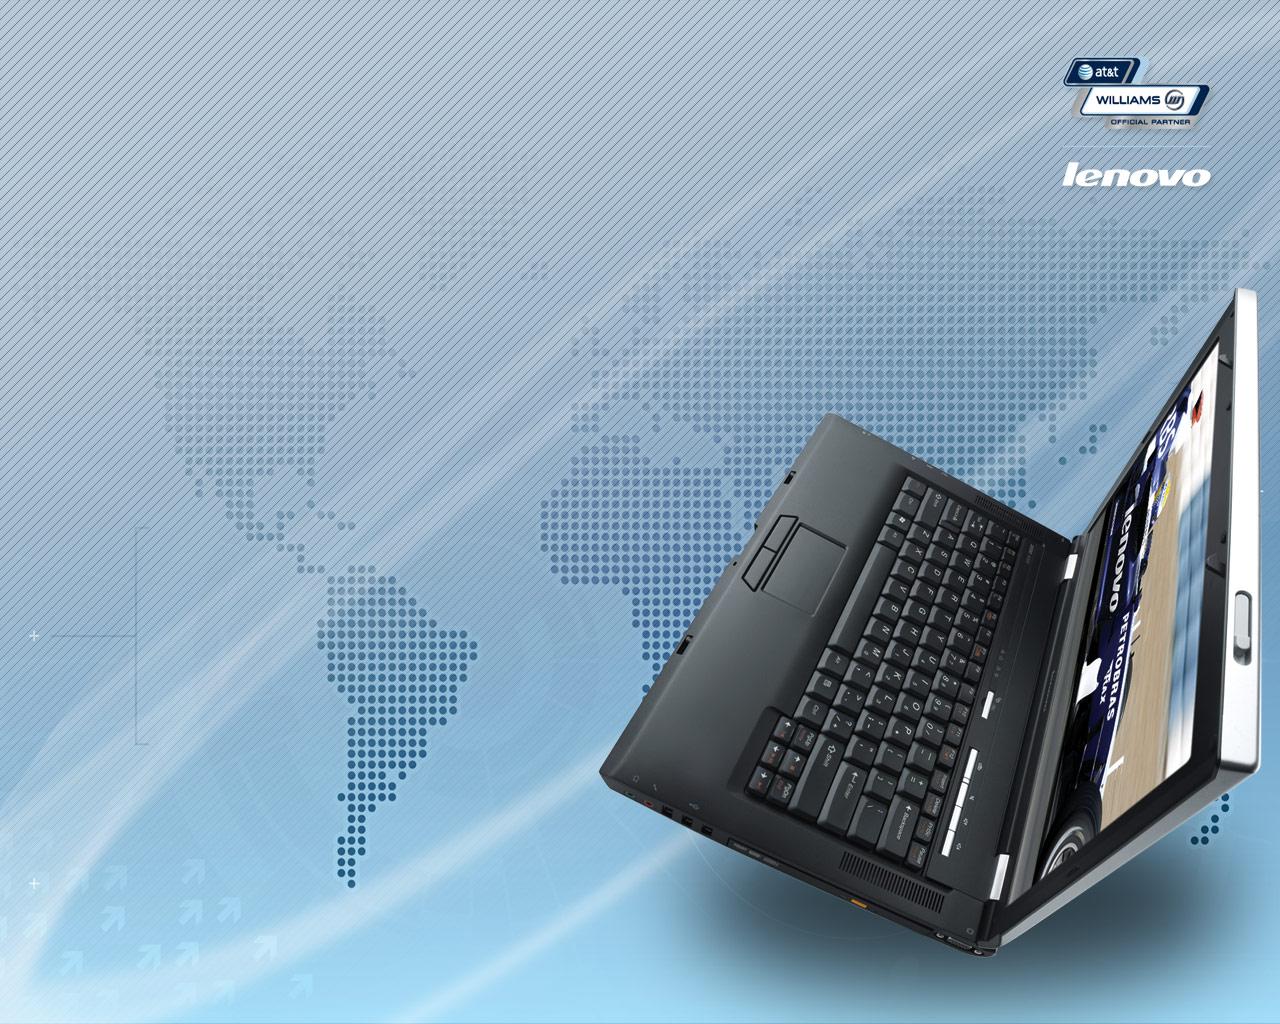 PC 3000